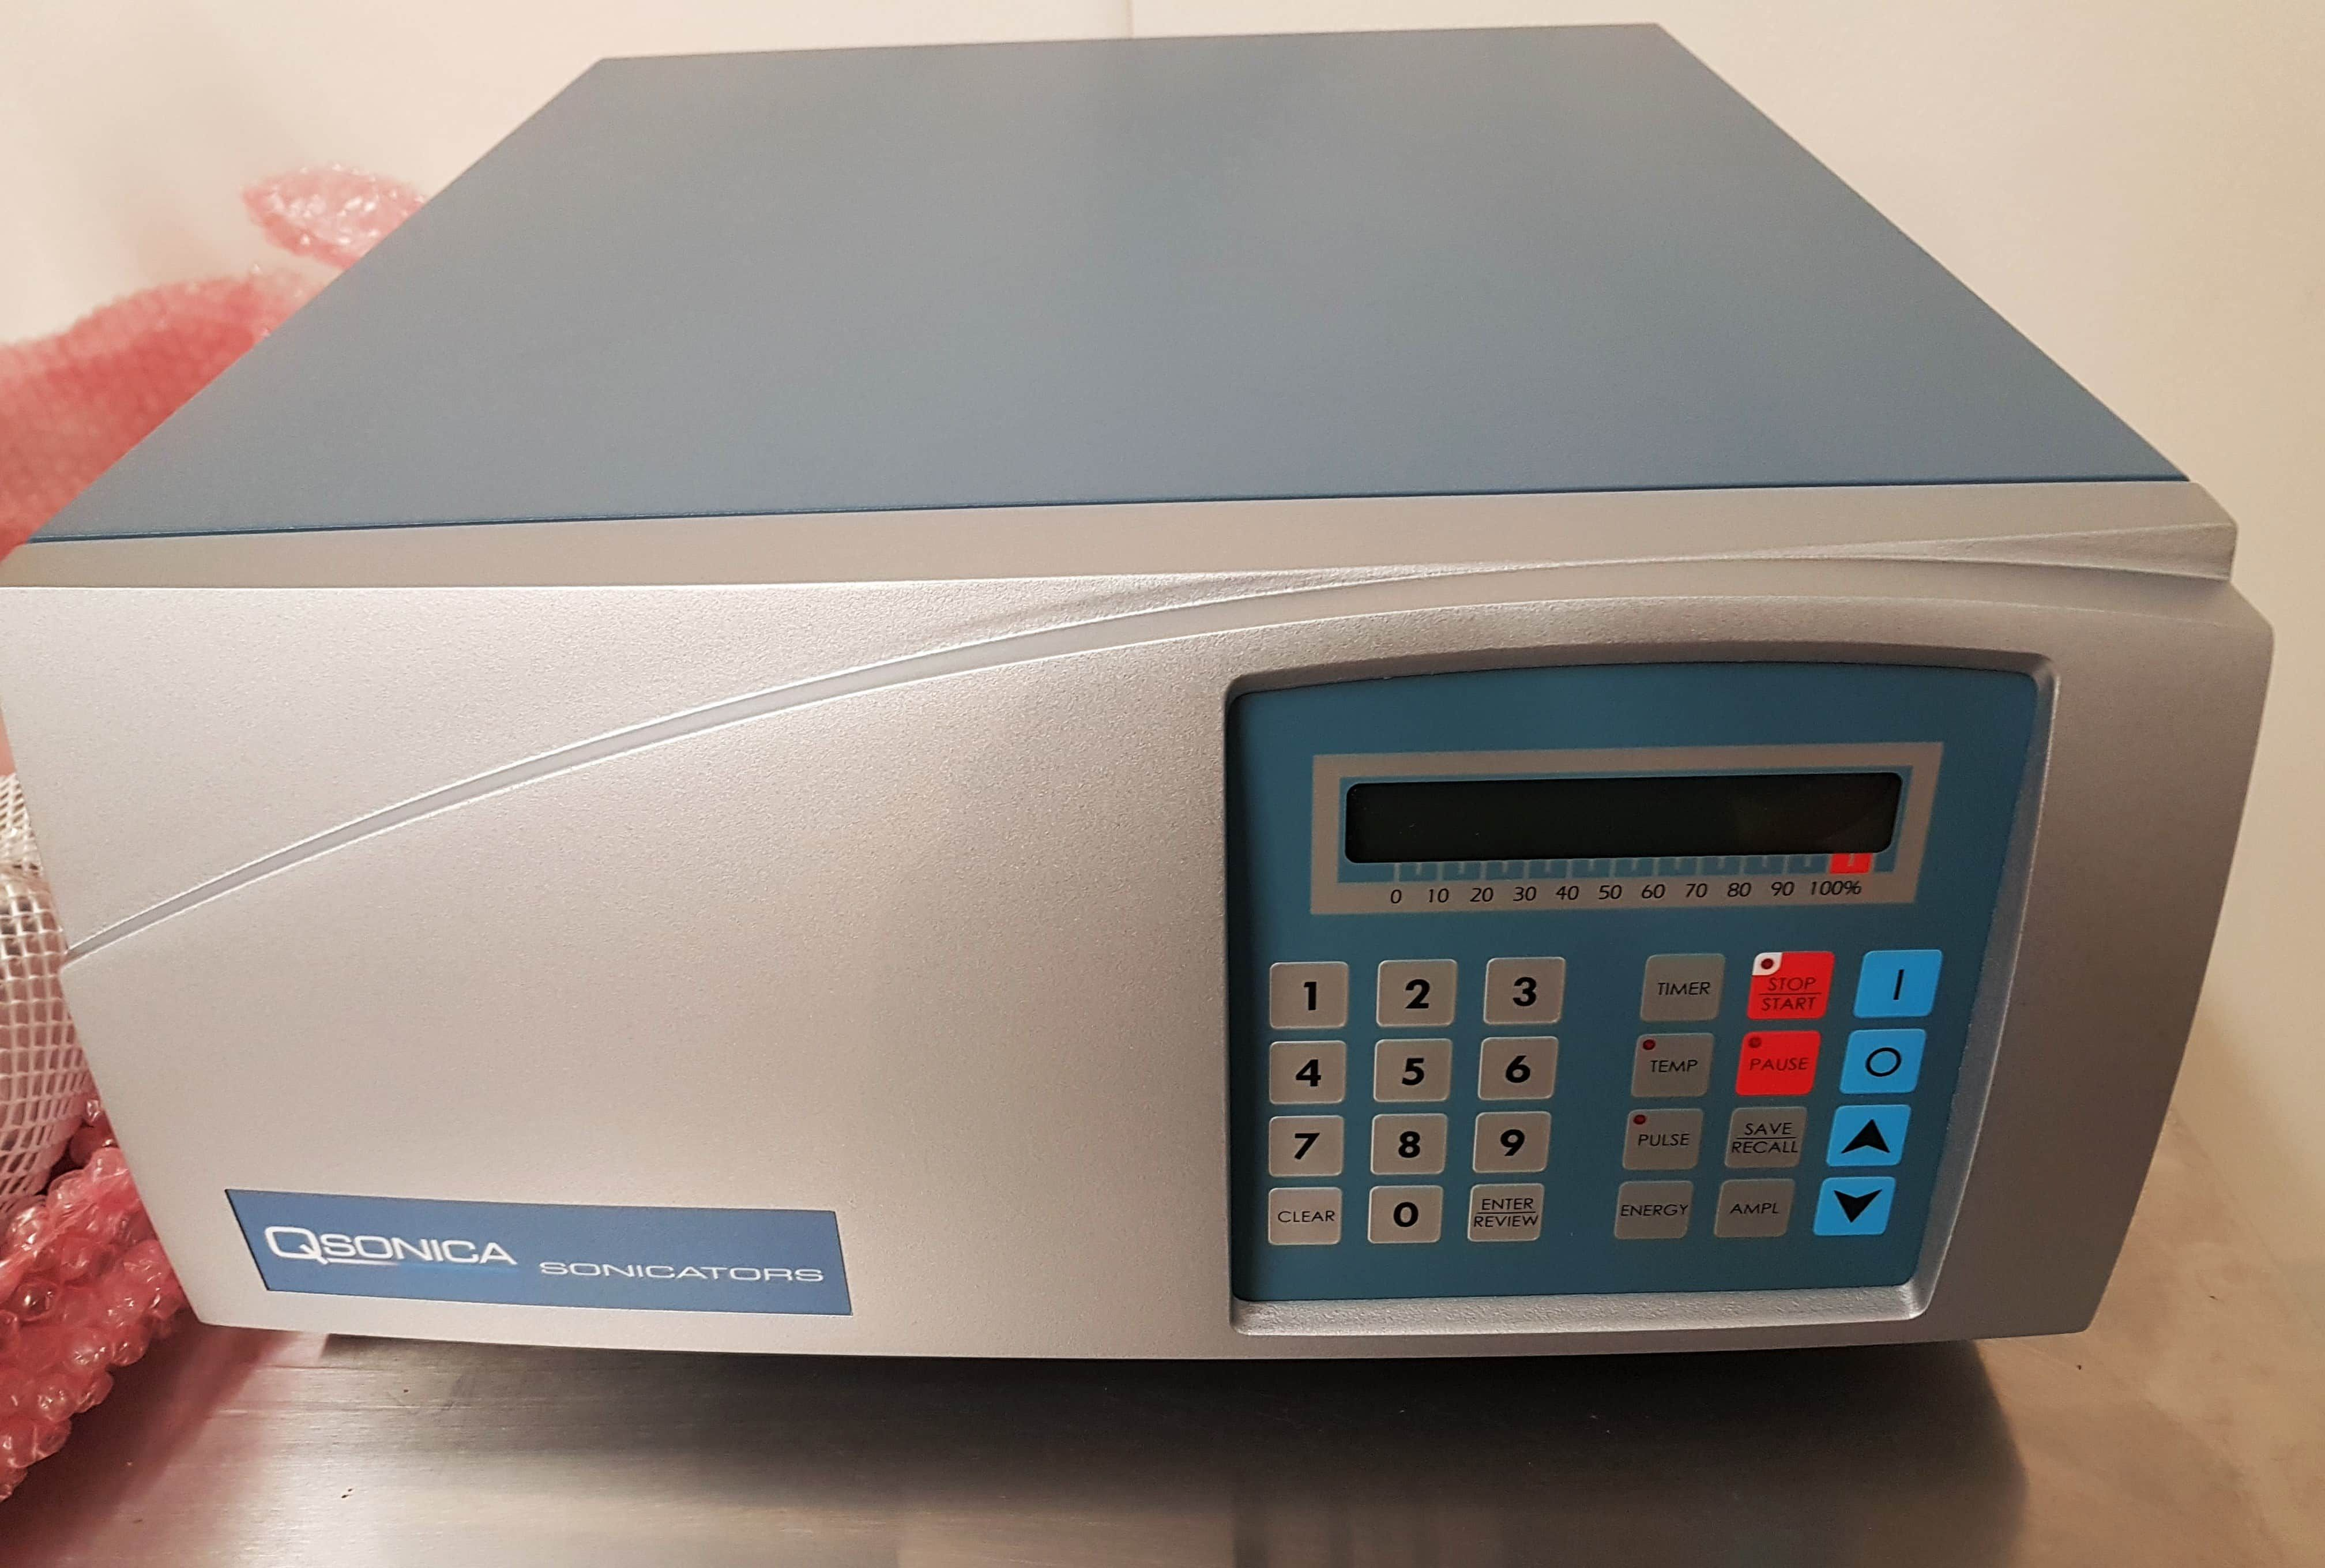 QSonica Q2000 Ultrasonic Processor with Accessories